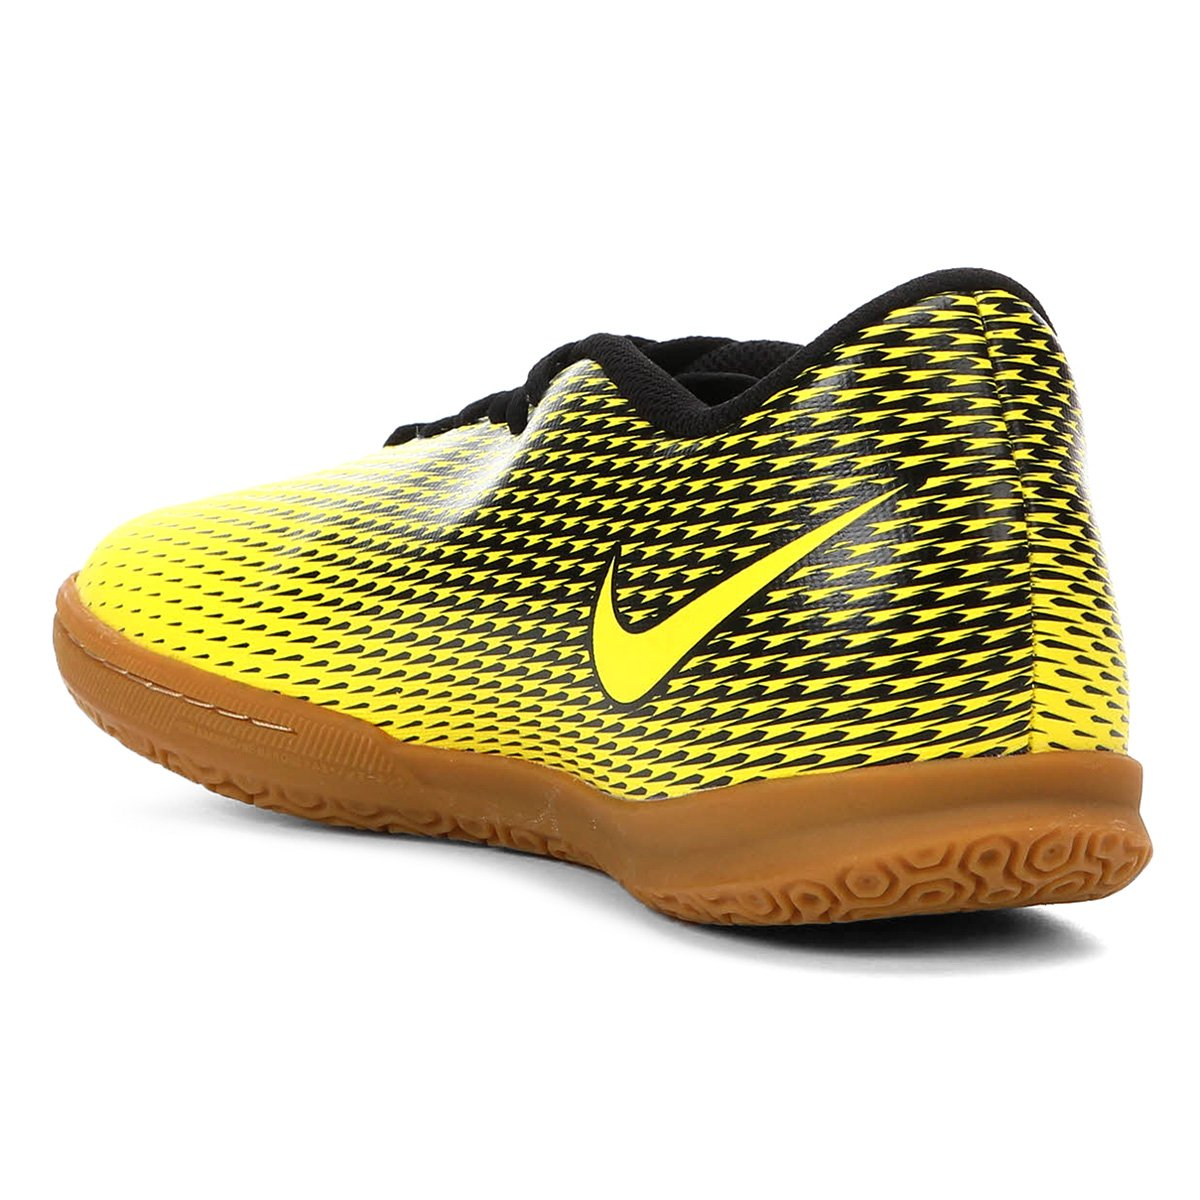 Chuteira Futsal Nike Bravata II IC - Amarelo e Preto - Compre Agora ... ee044dc5016c5